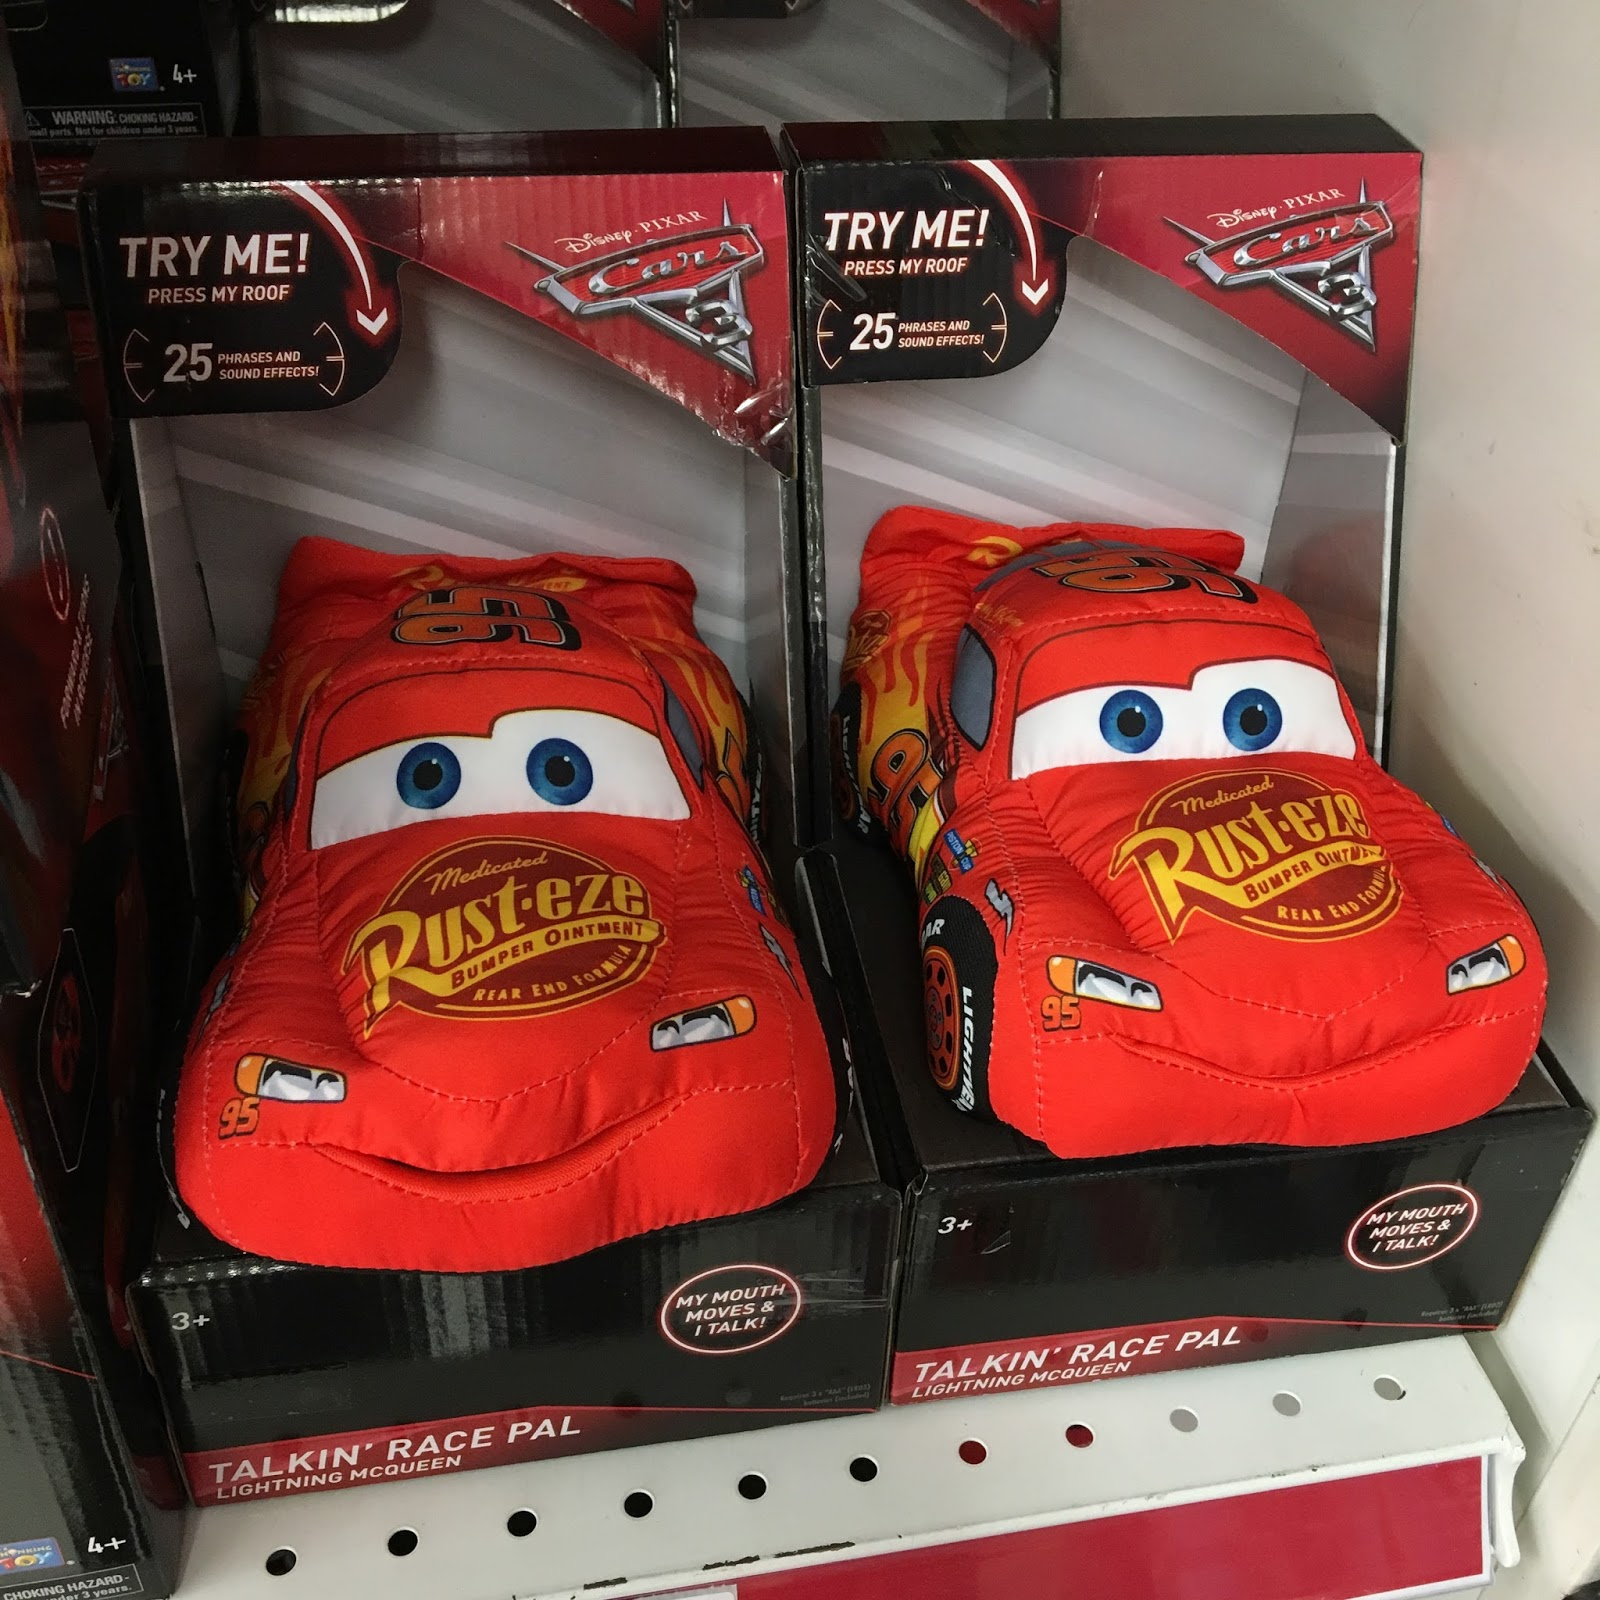 pixar cars 3 toys merchandise release 2017 toys r us